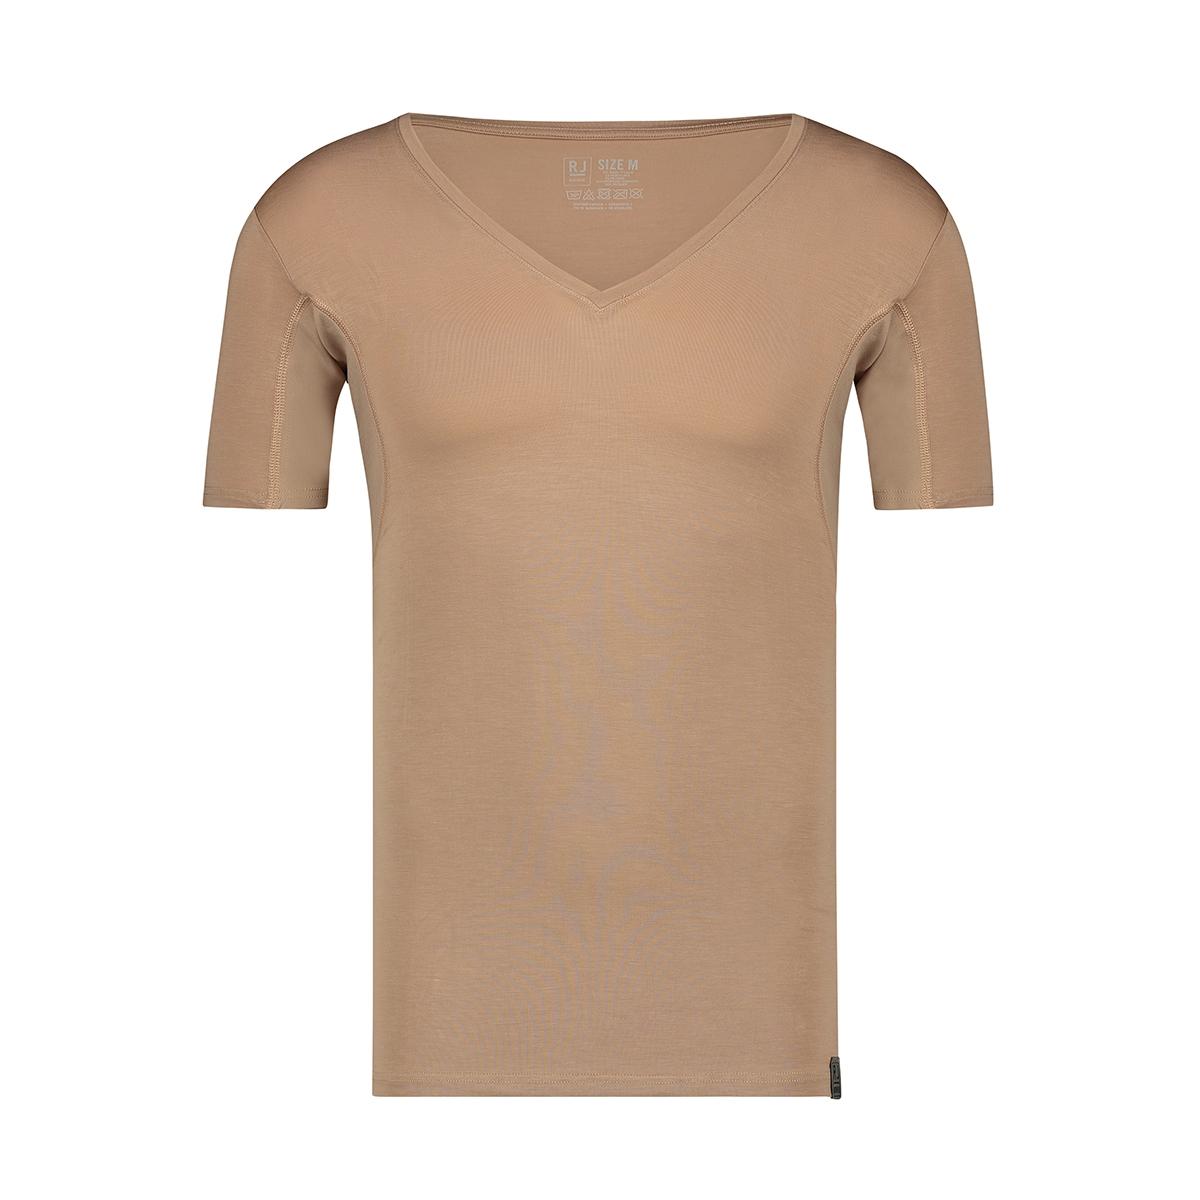 copenhagen sweatproof rj bodywear t-shirt natural